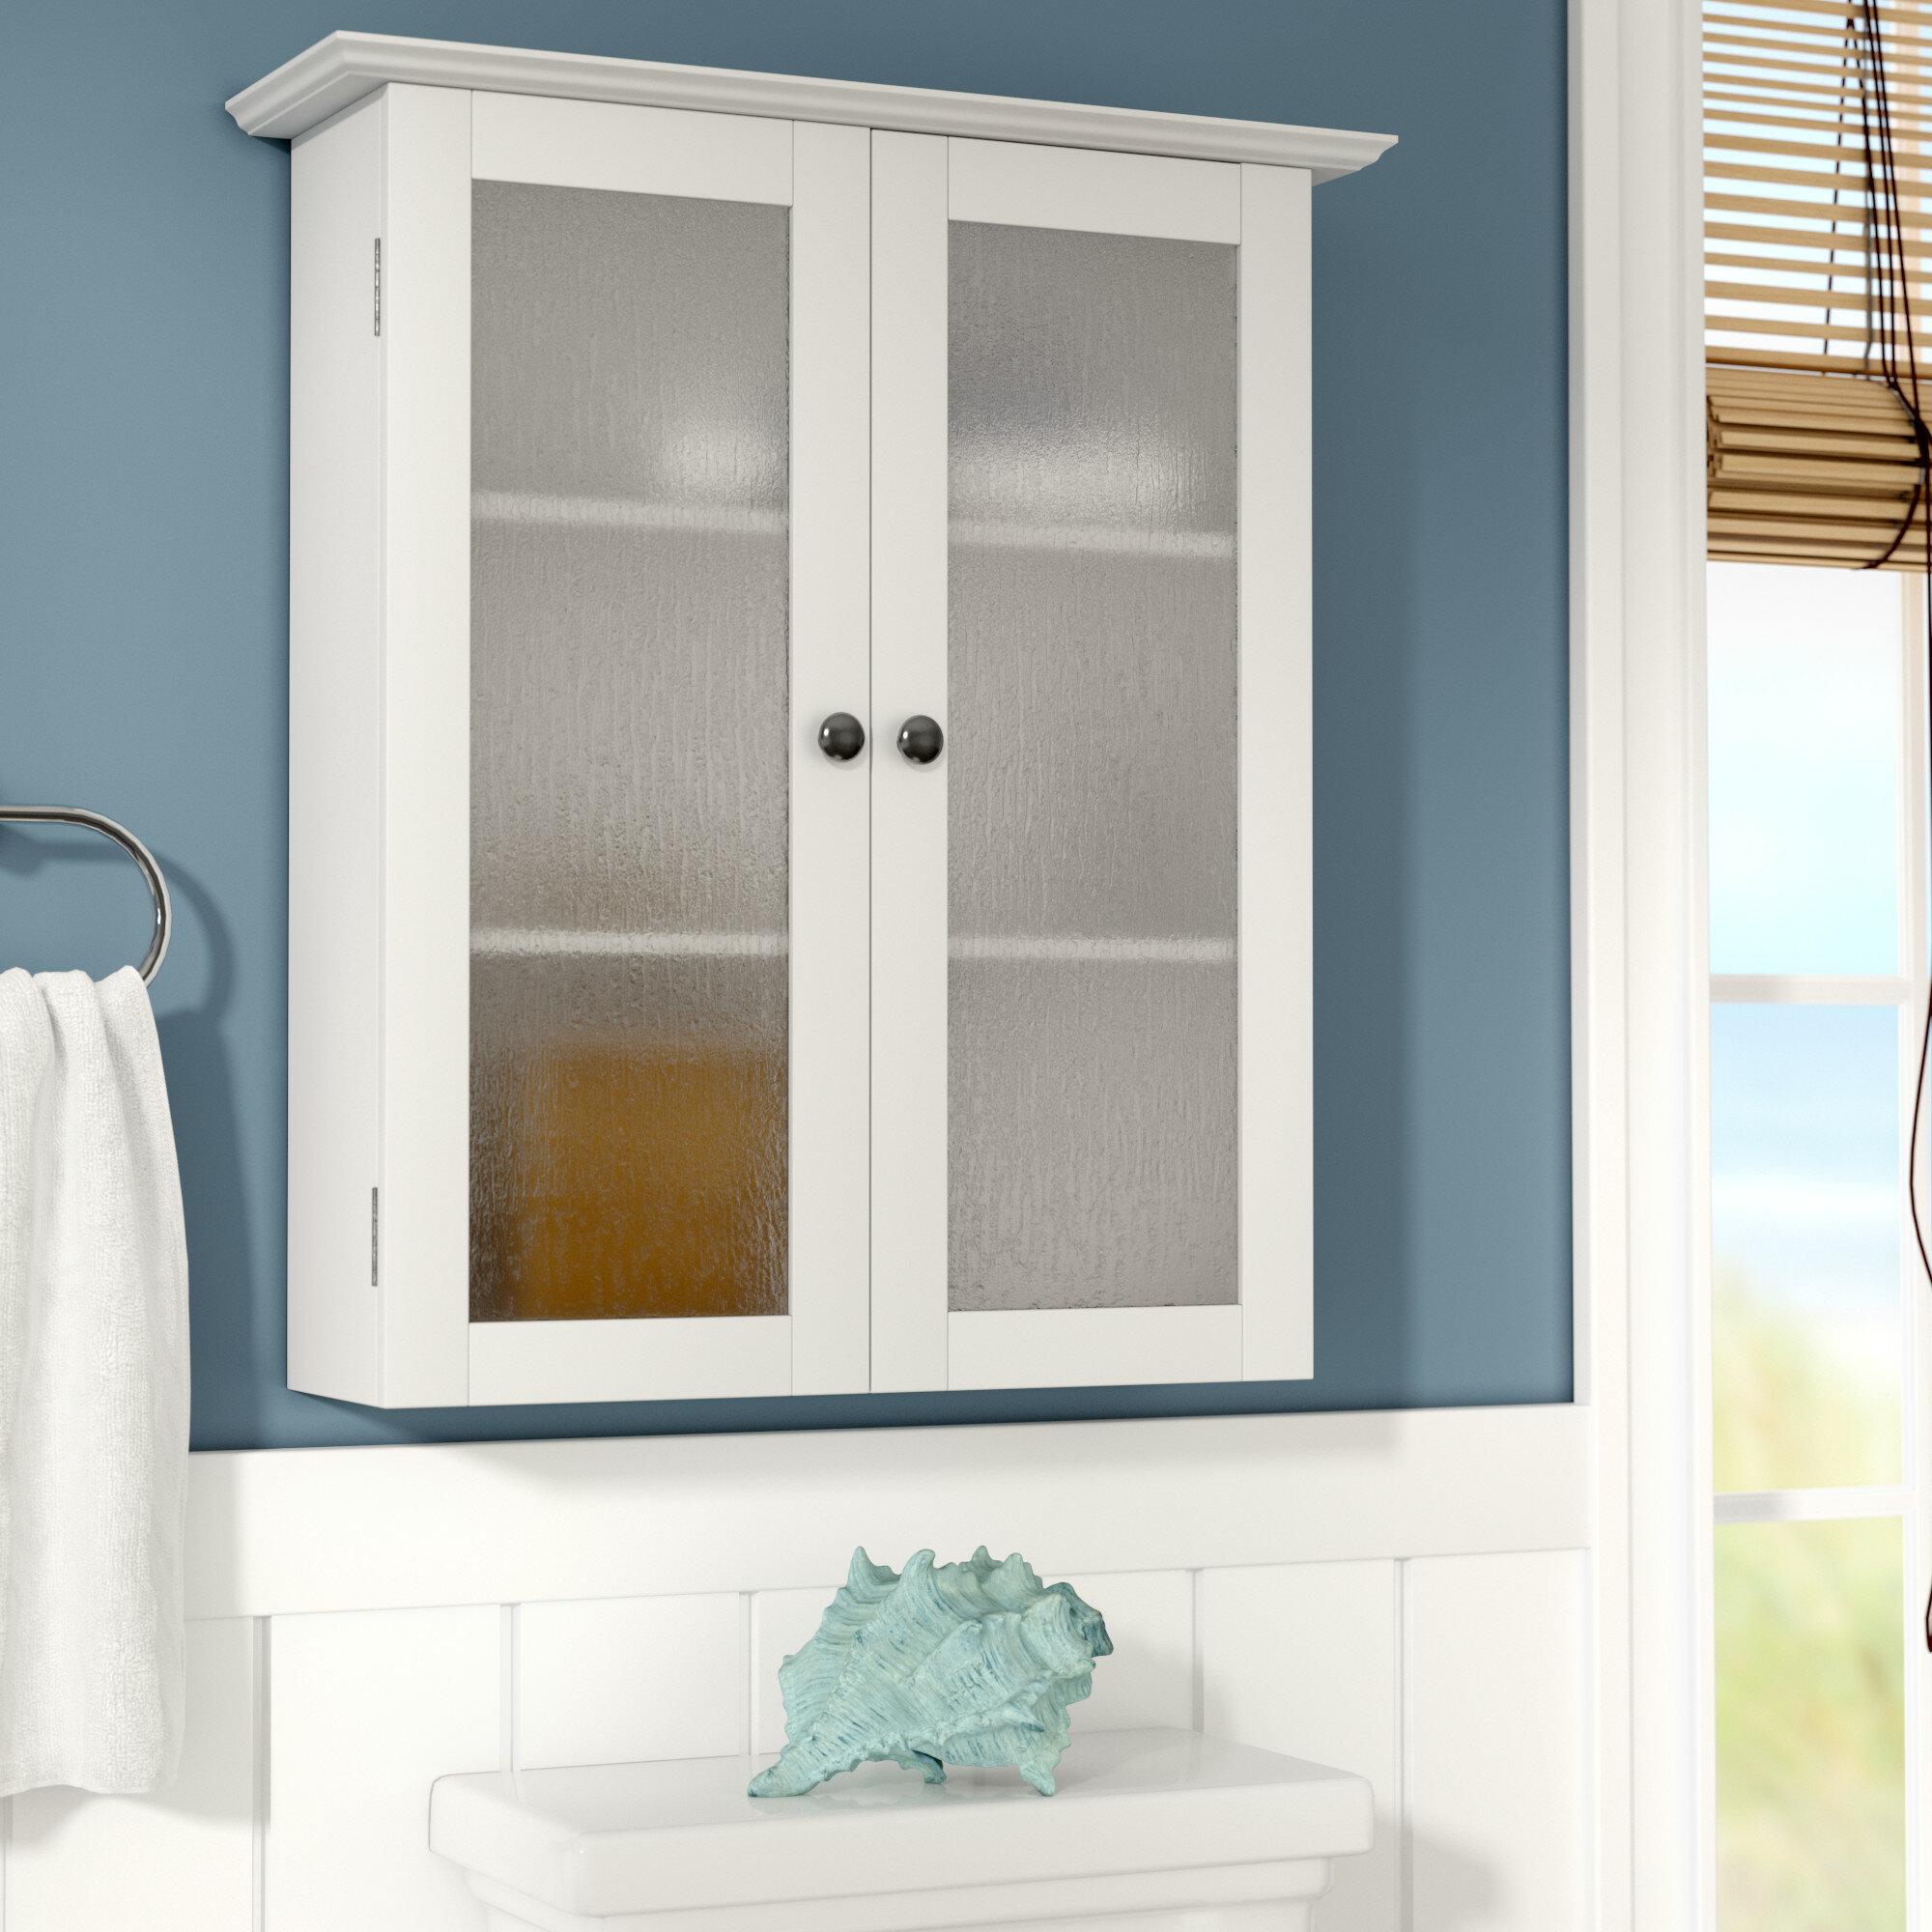 Beachcrest Home Raglen 22 25 W X 25 H X 8 D Wall Mounted Bathroom Cabinet Reviews Wayfair